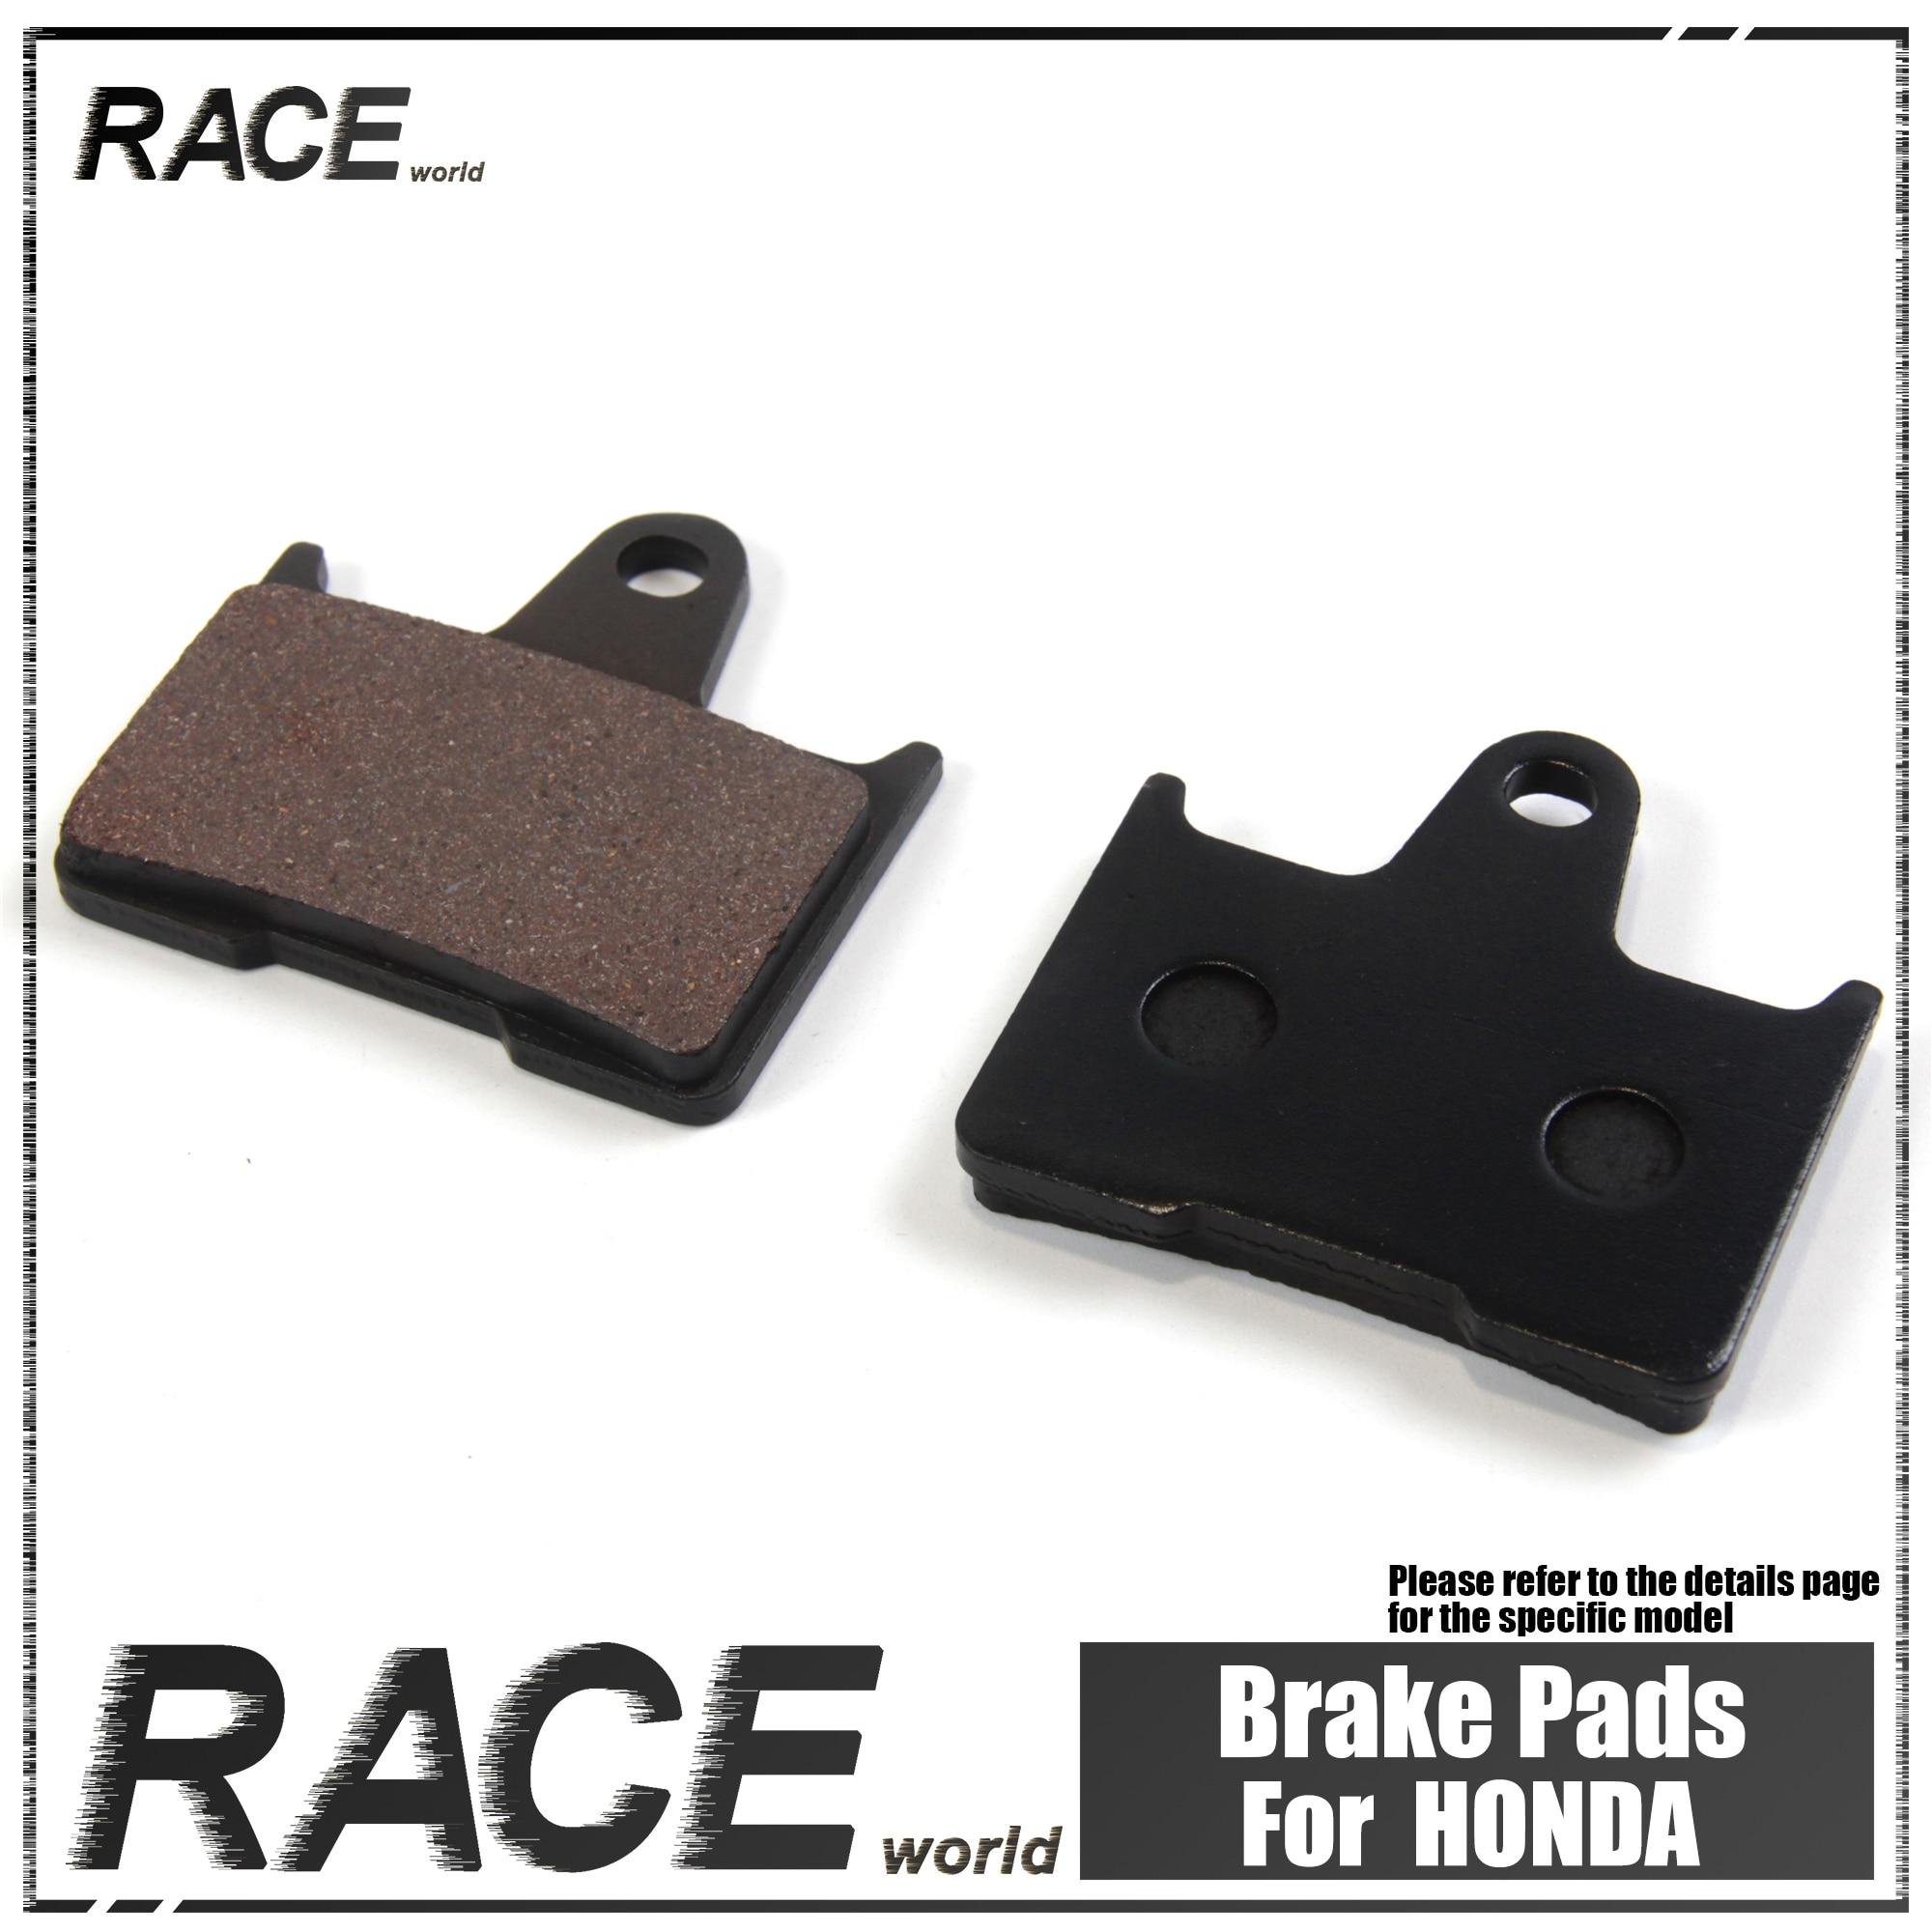 Motorcycles Front / Rear Brake Pads For HONDA CB400 SFX 1999 - 2003 'X4' CB 1300 DCV 1997 For MZ/MUZ 1000 SF 2005 - 2007